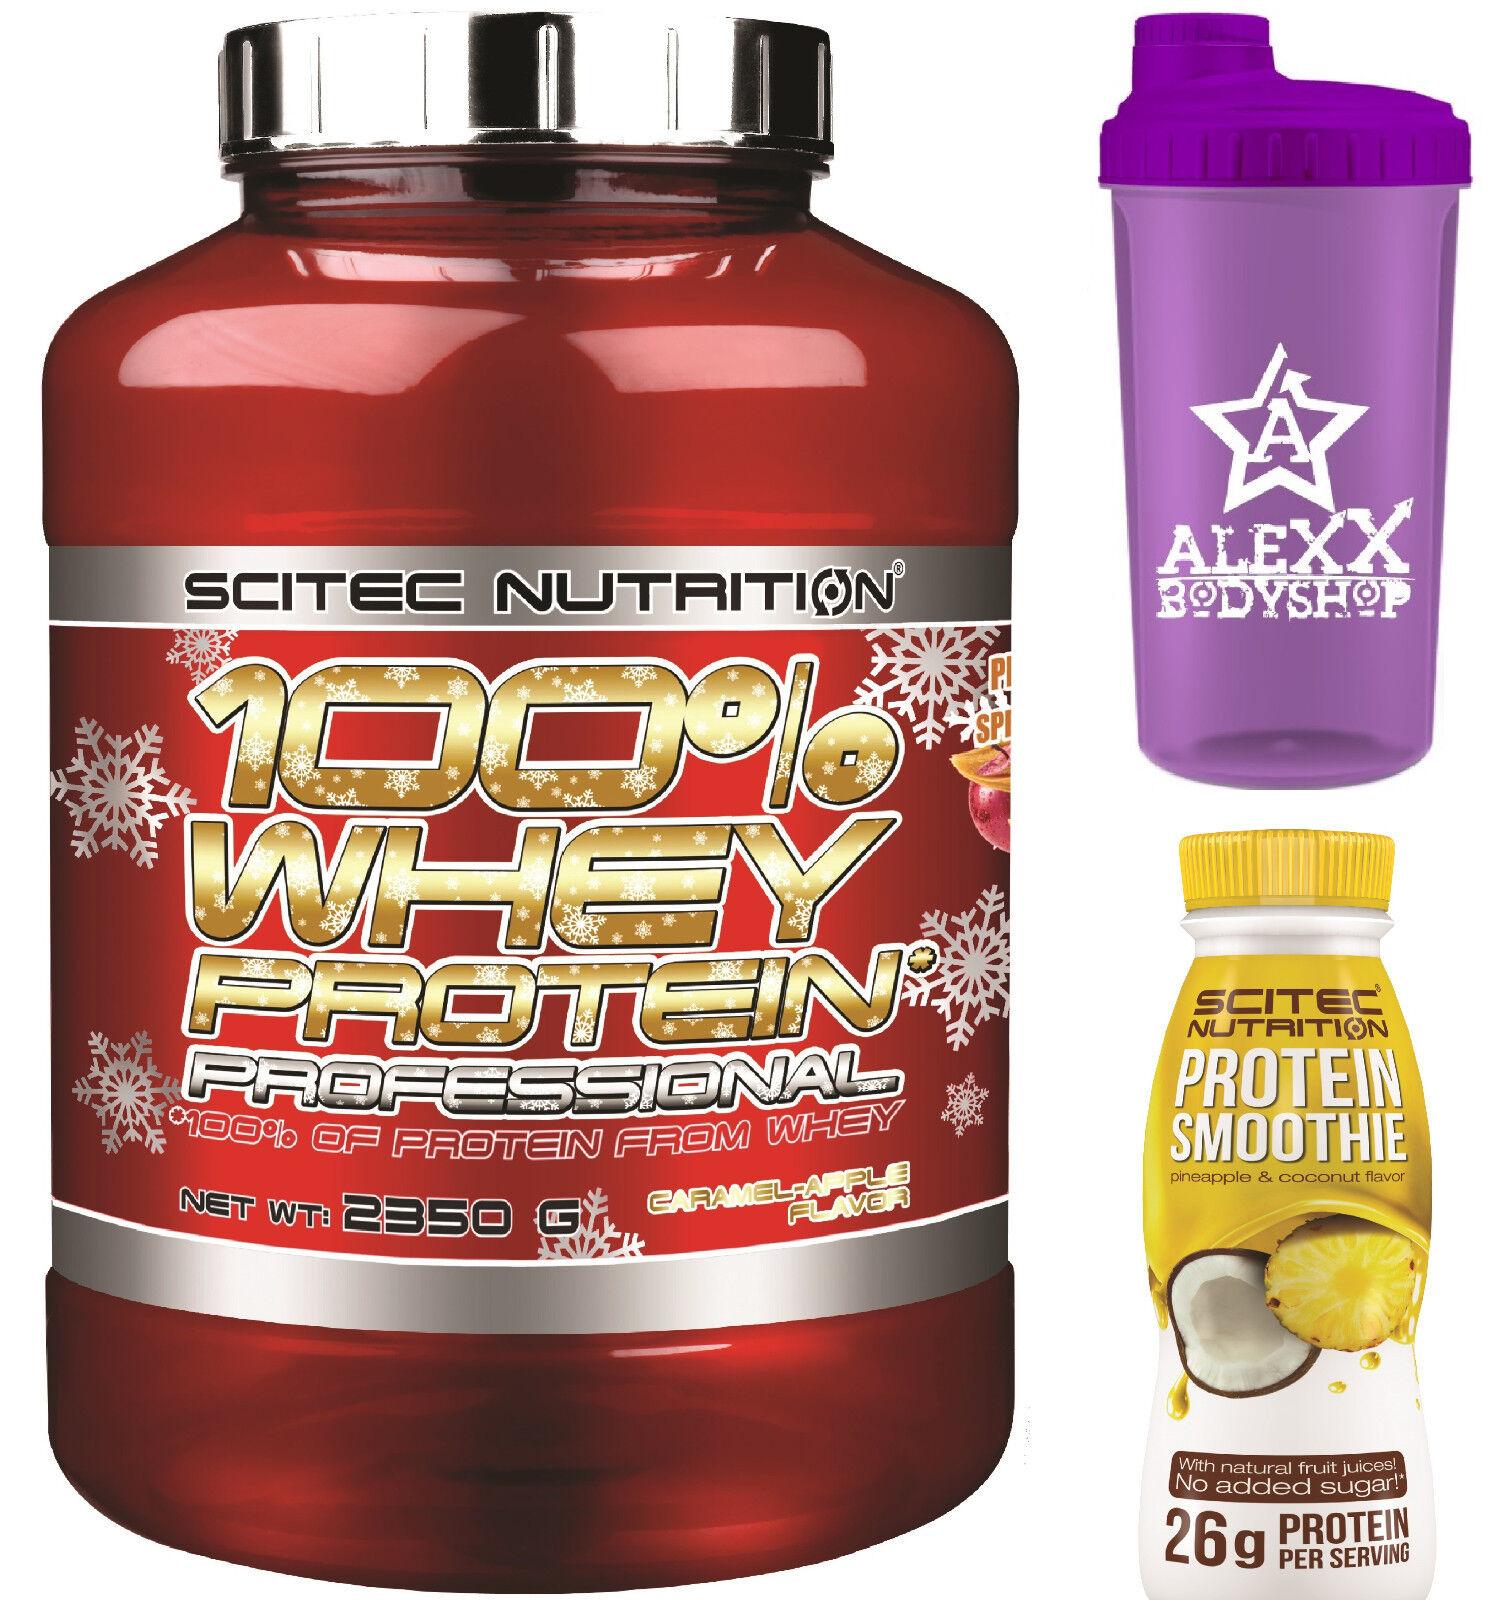 Scitec Nutrition 100% Whey Smoothie Protein Prof. 2350g + Protein Smoothie Whey 330ml + Shaker 7ad660